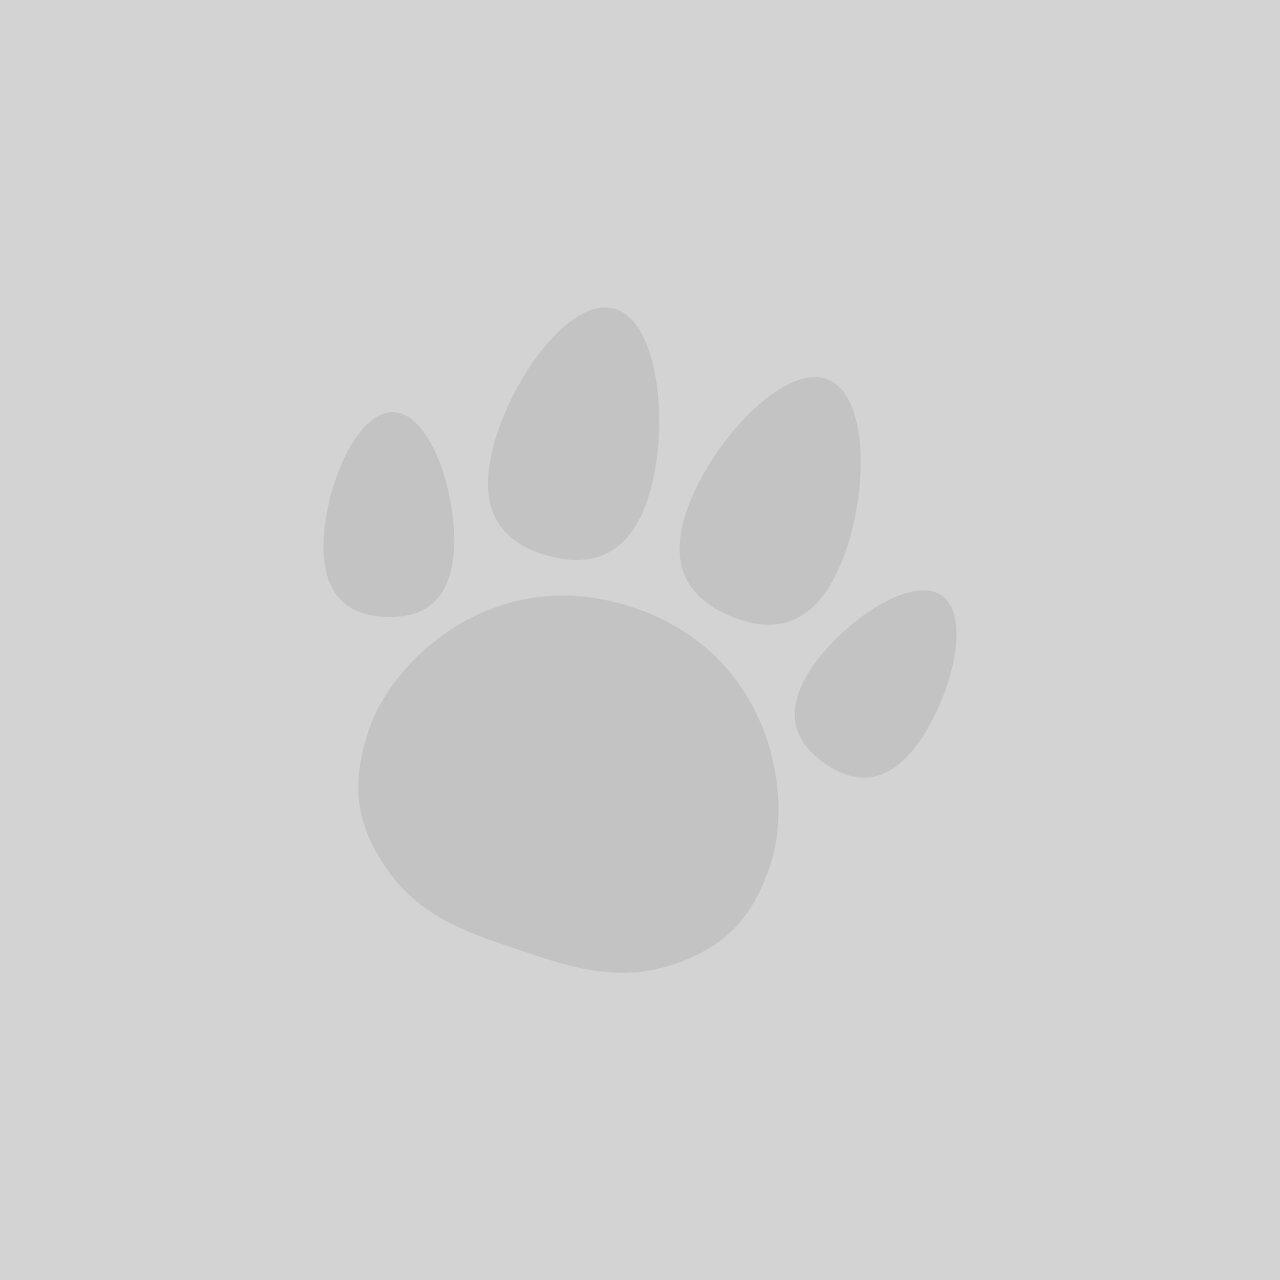 Johnson's Puppy And Kitten Shampoo 200ml